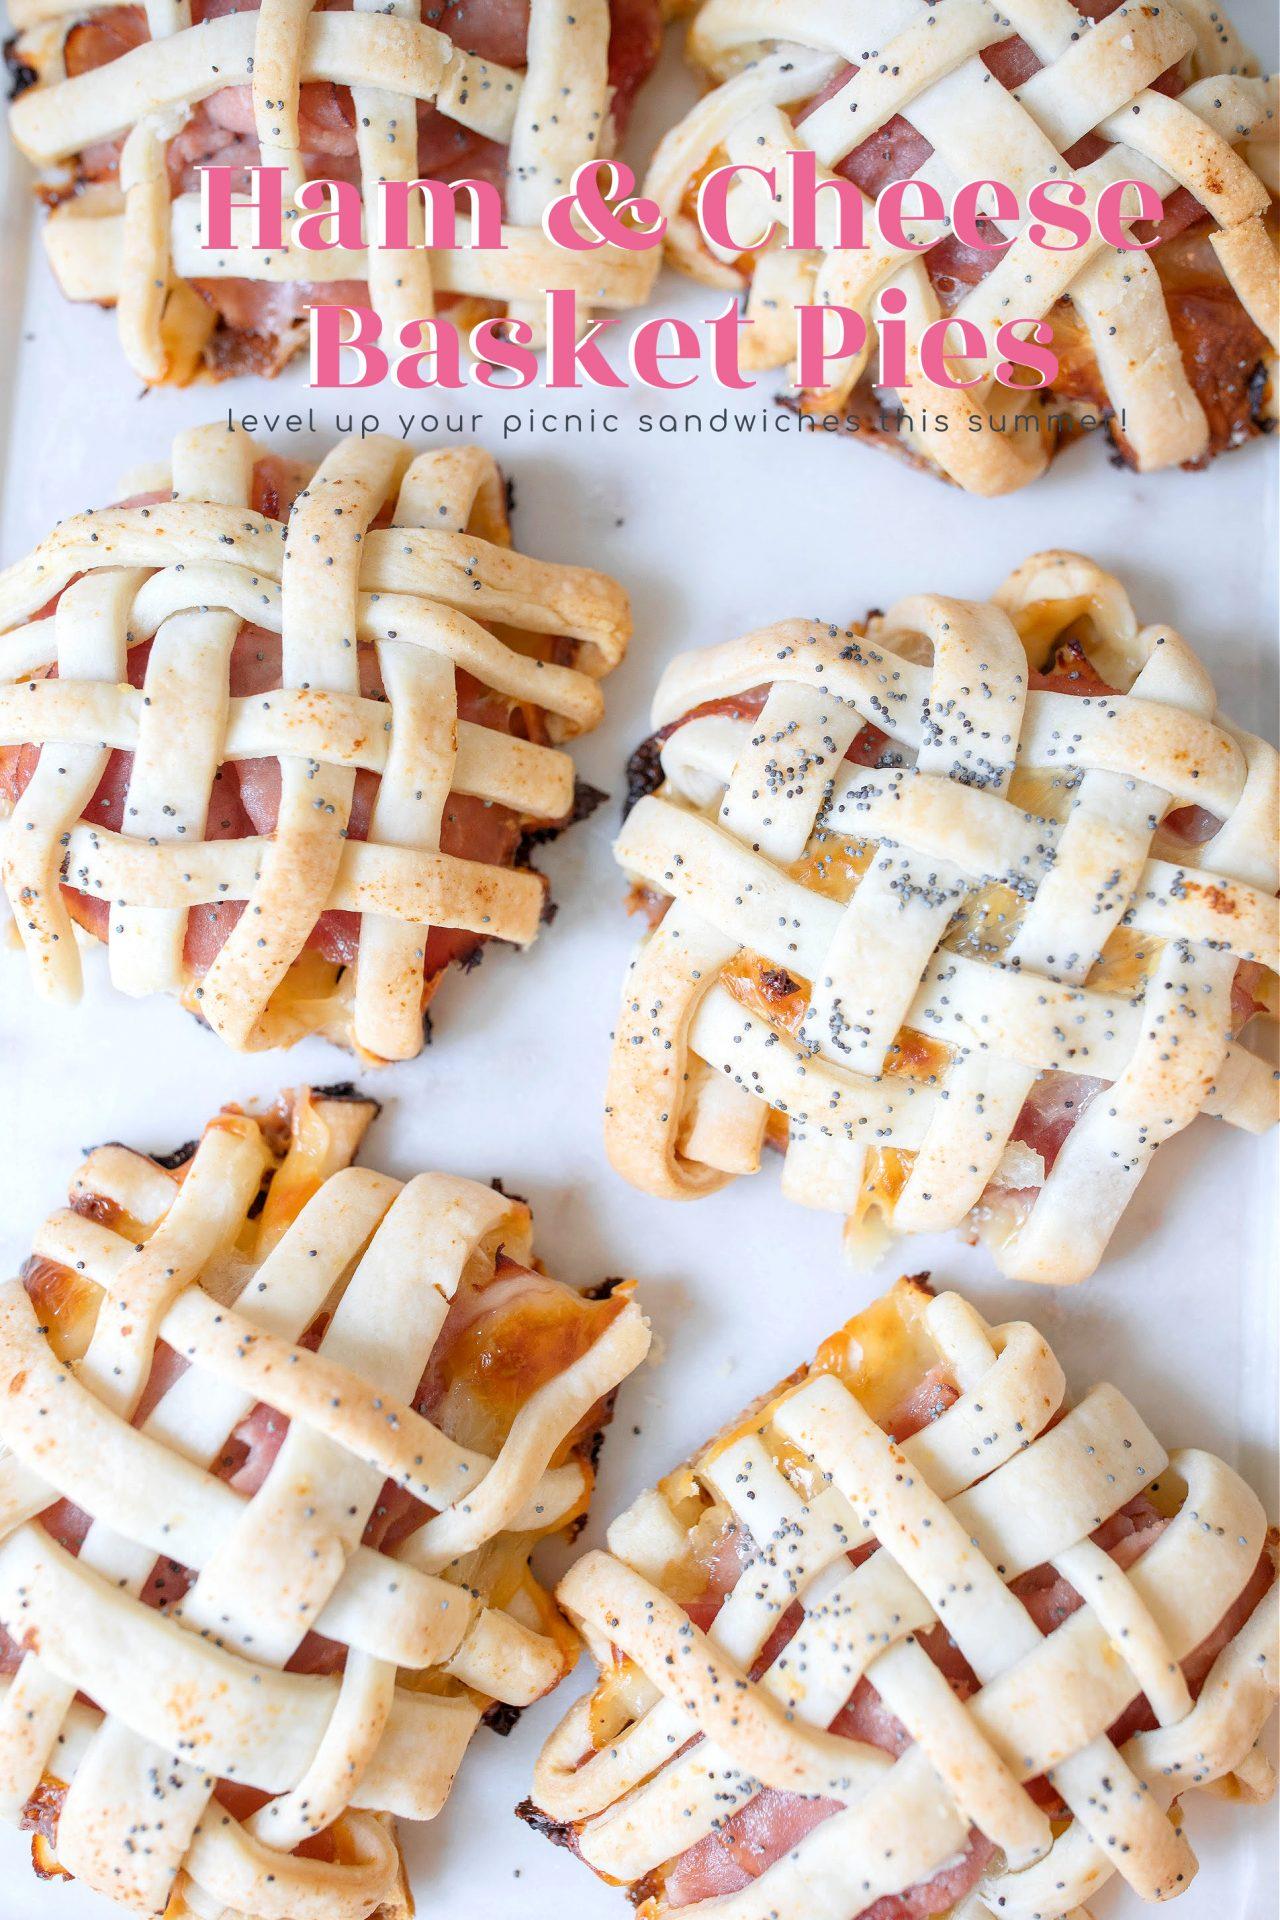 ham and cheese basket pies, sandwiches, picnic, pie savory, pot pie, baked poppy seed sandwiches, picnic food, recipe, easter, ham and cheese, easter recipe, spring, tiktok,